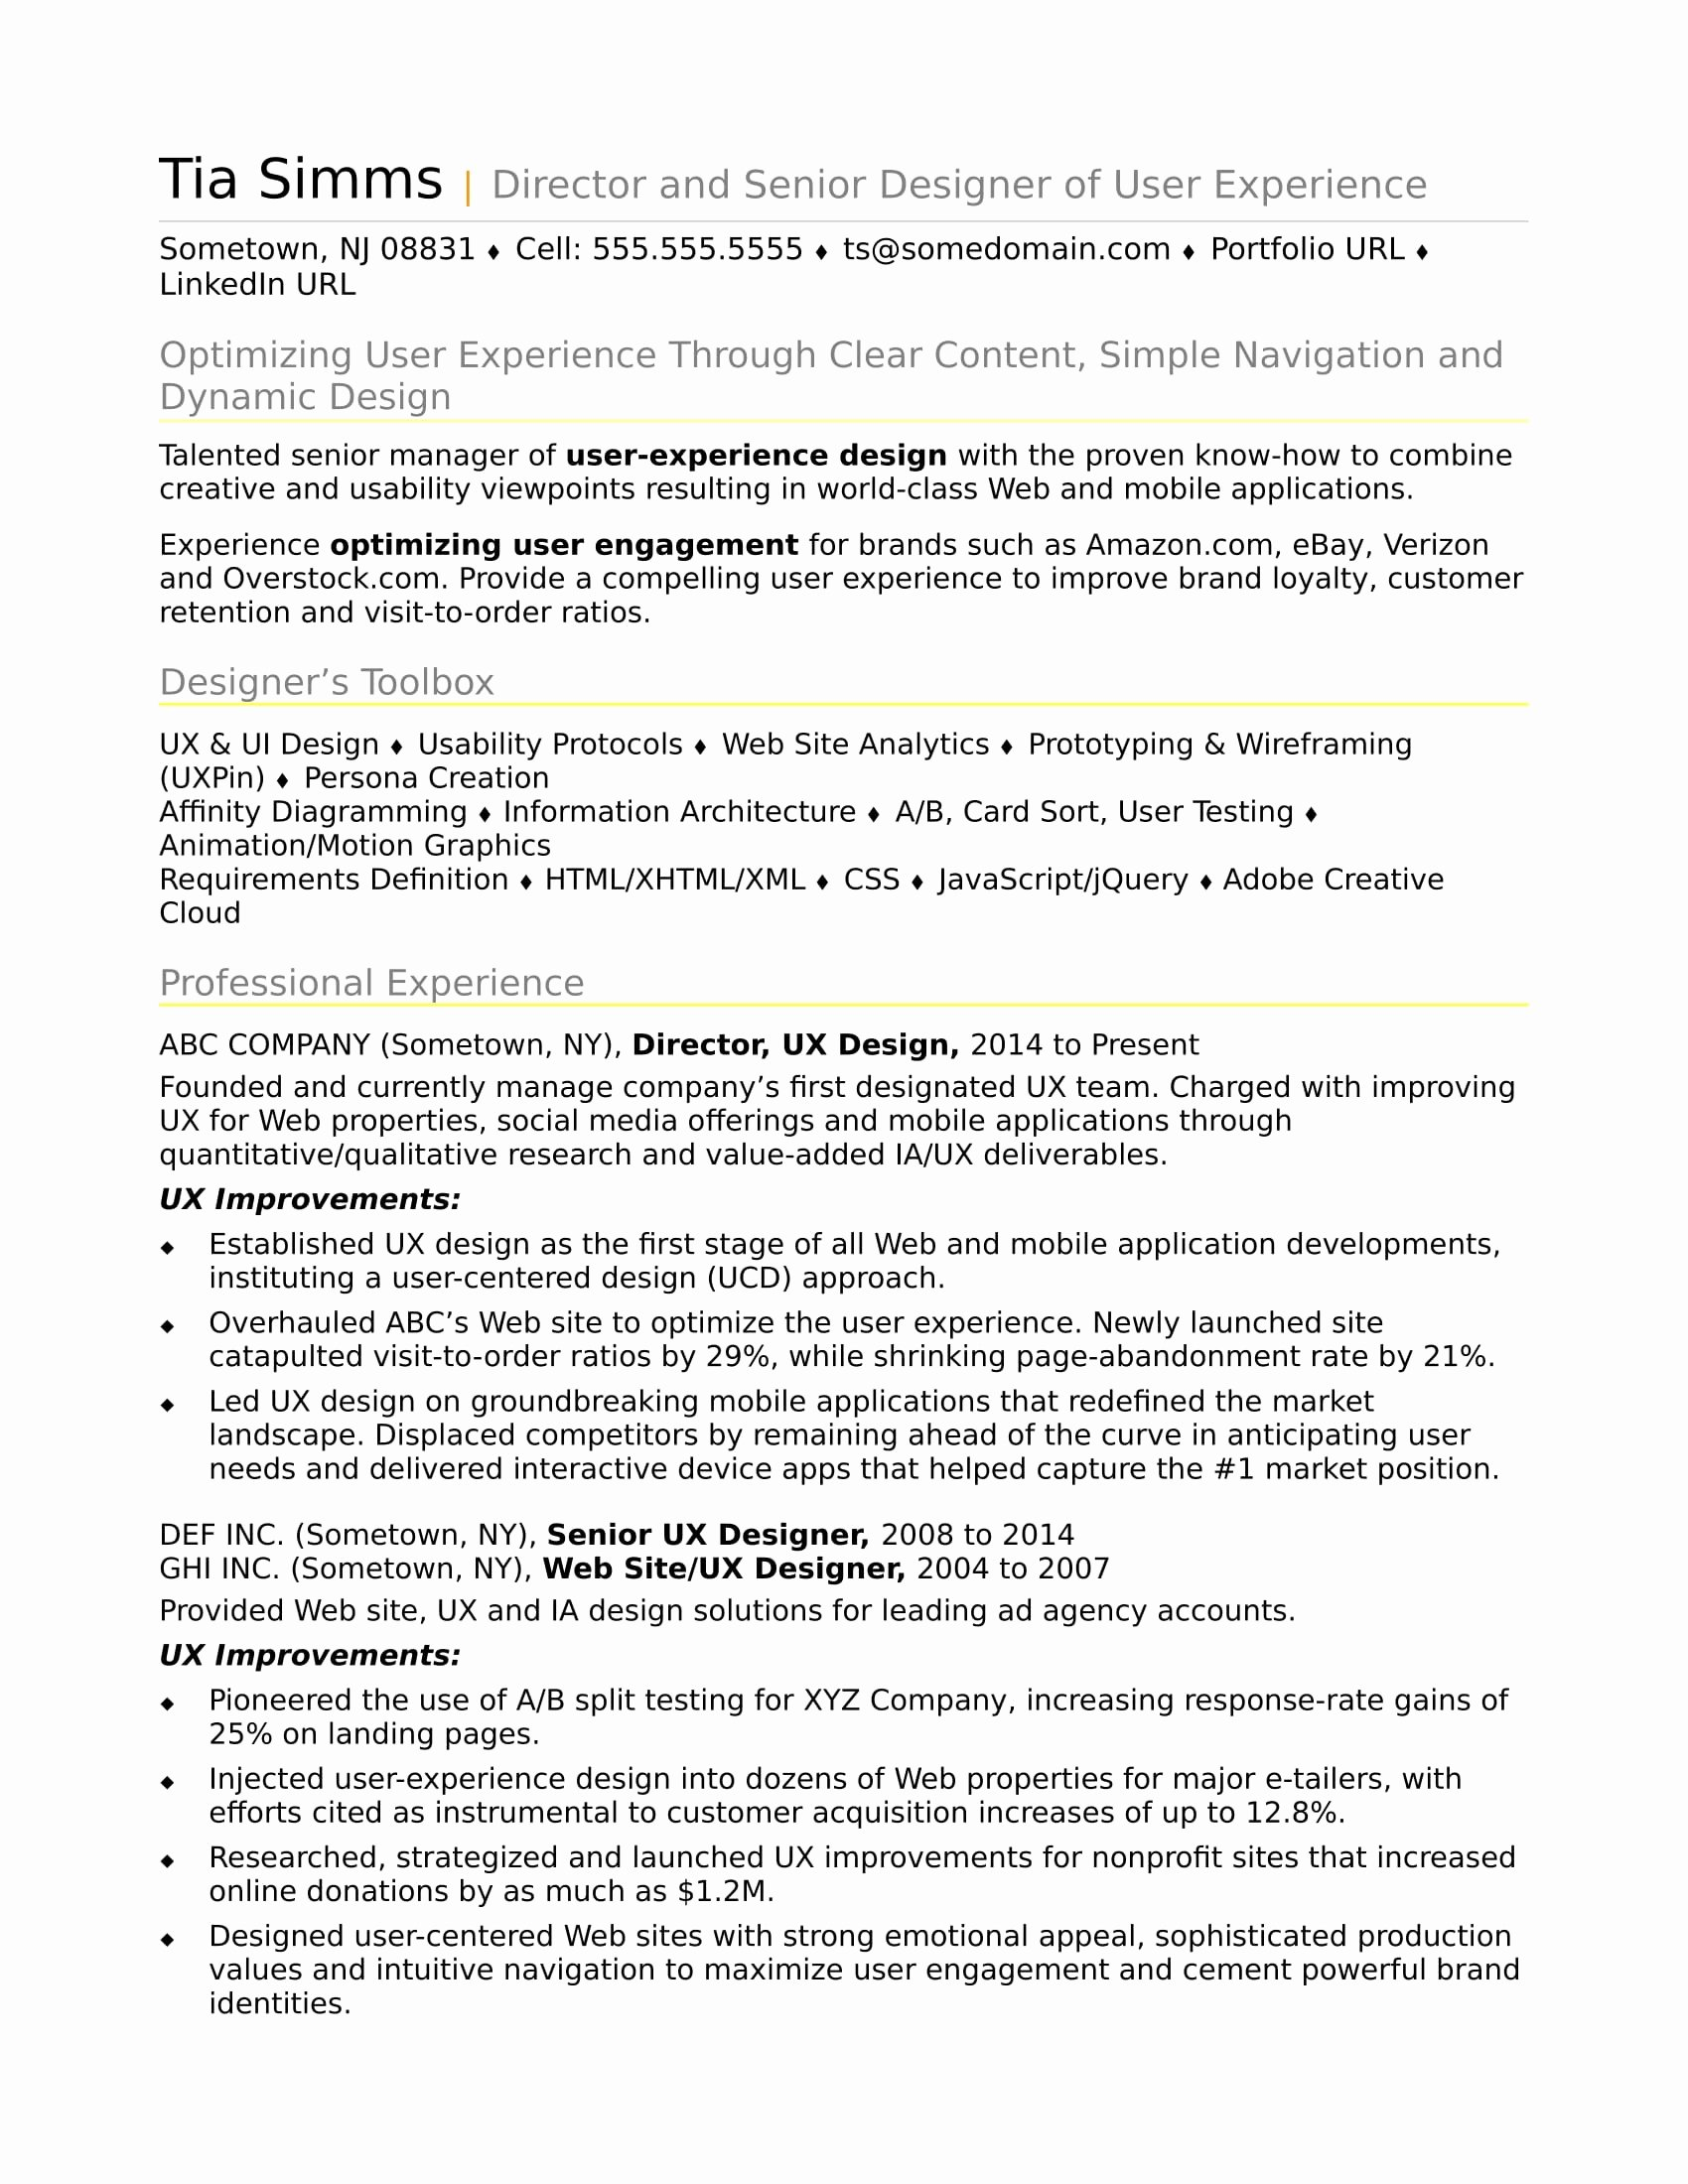 Cover Letter Sample for Ui Designer Save Sample Resume for